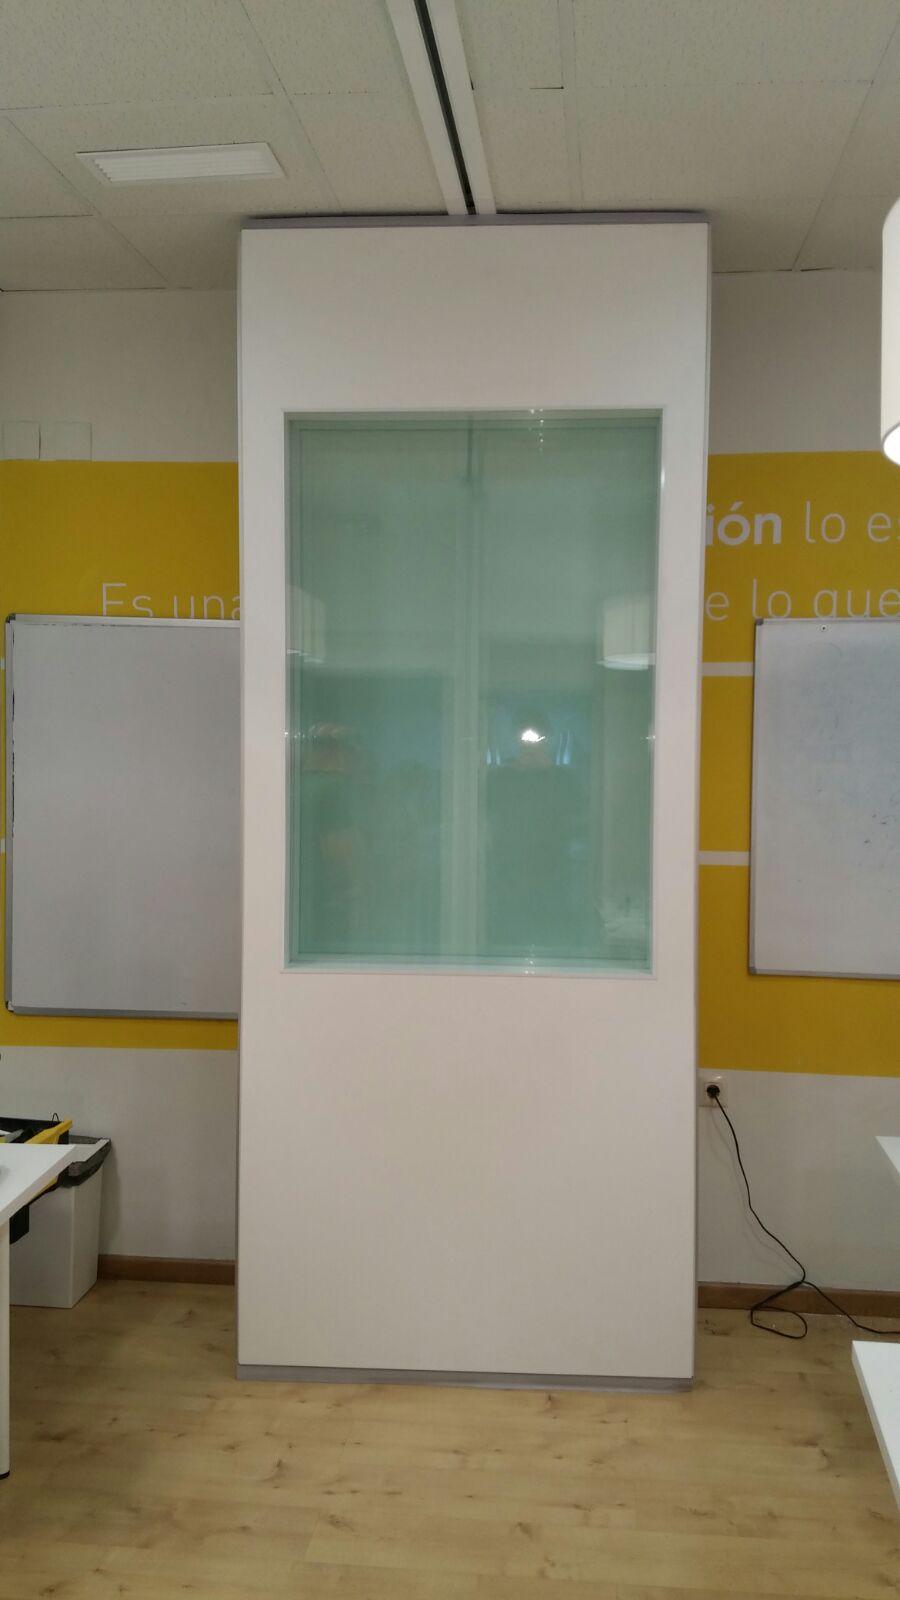 Tabique móvil mixto modelo 6800 con vidrio